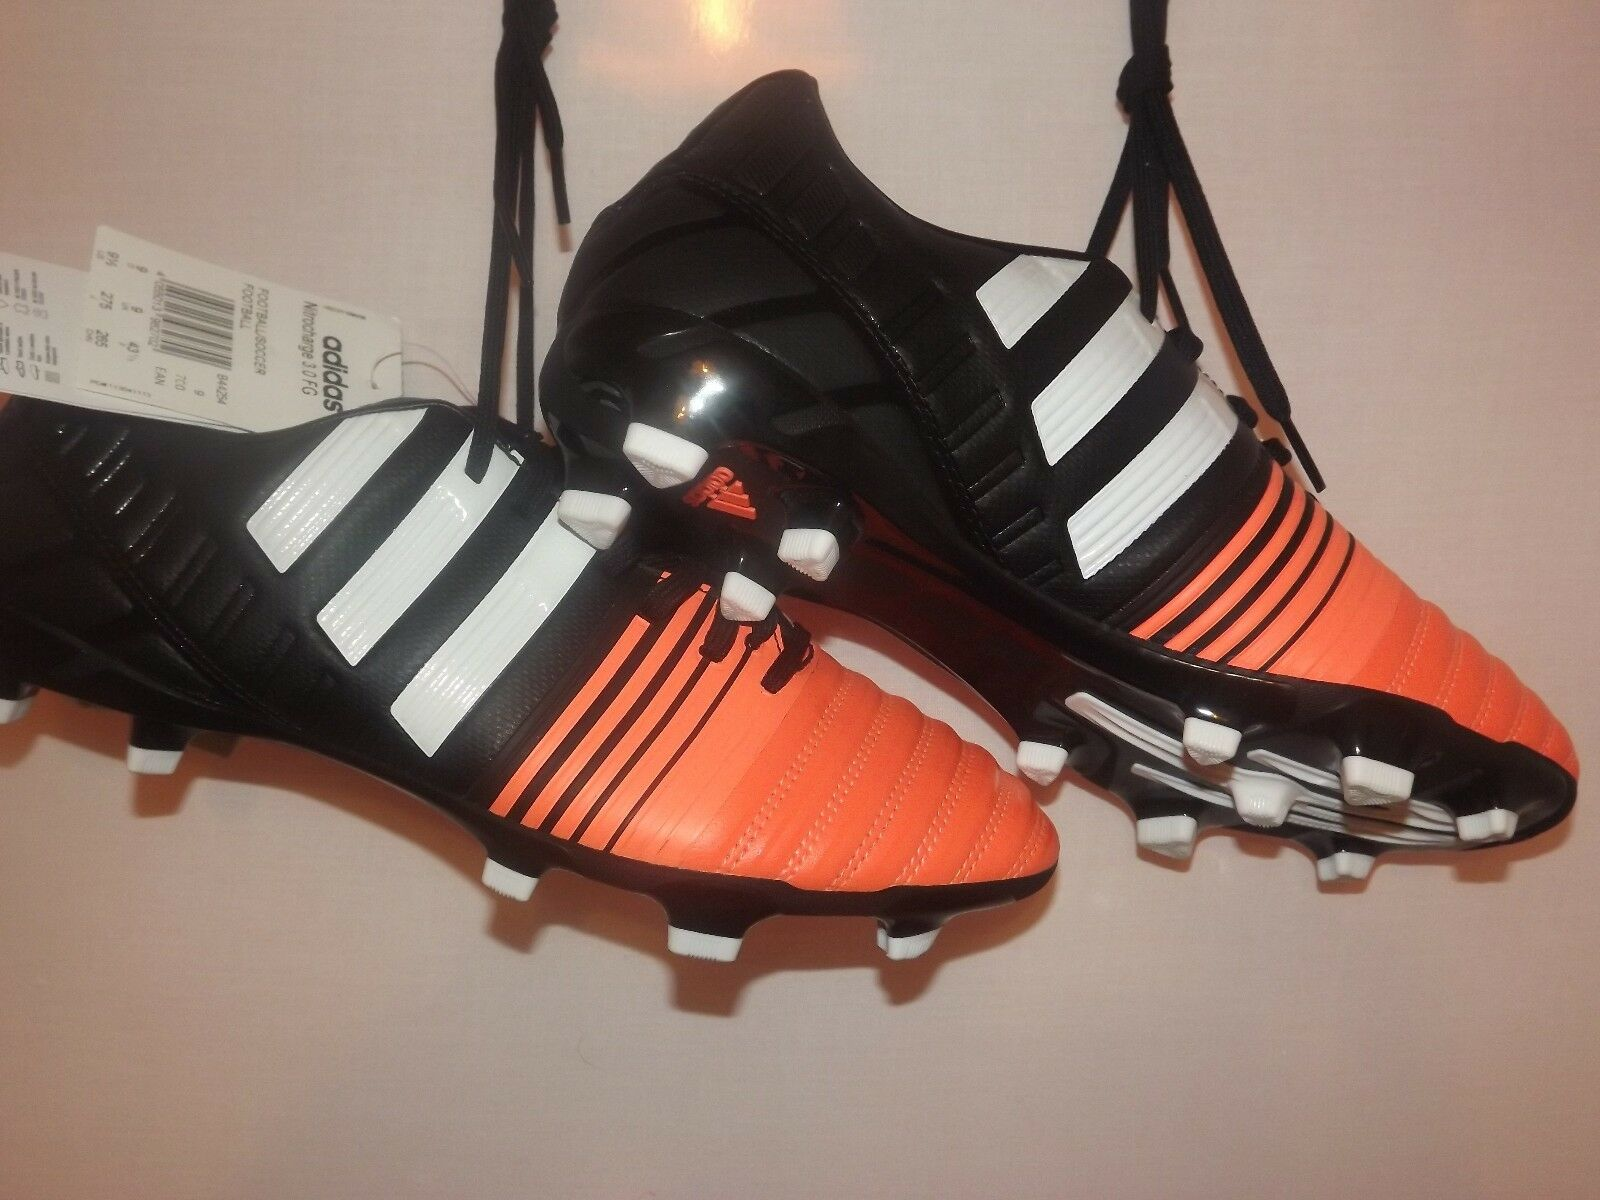 73b7fce68039b2 NITROCHARGE 3.0 FG FOOTBALL BOOTS 9UK (ORIGINAL) 06 ADIDAS MENS ...